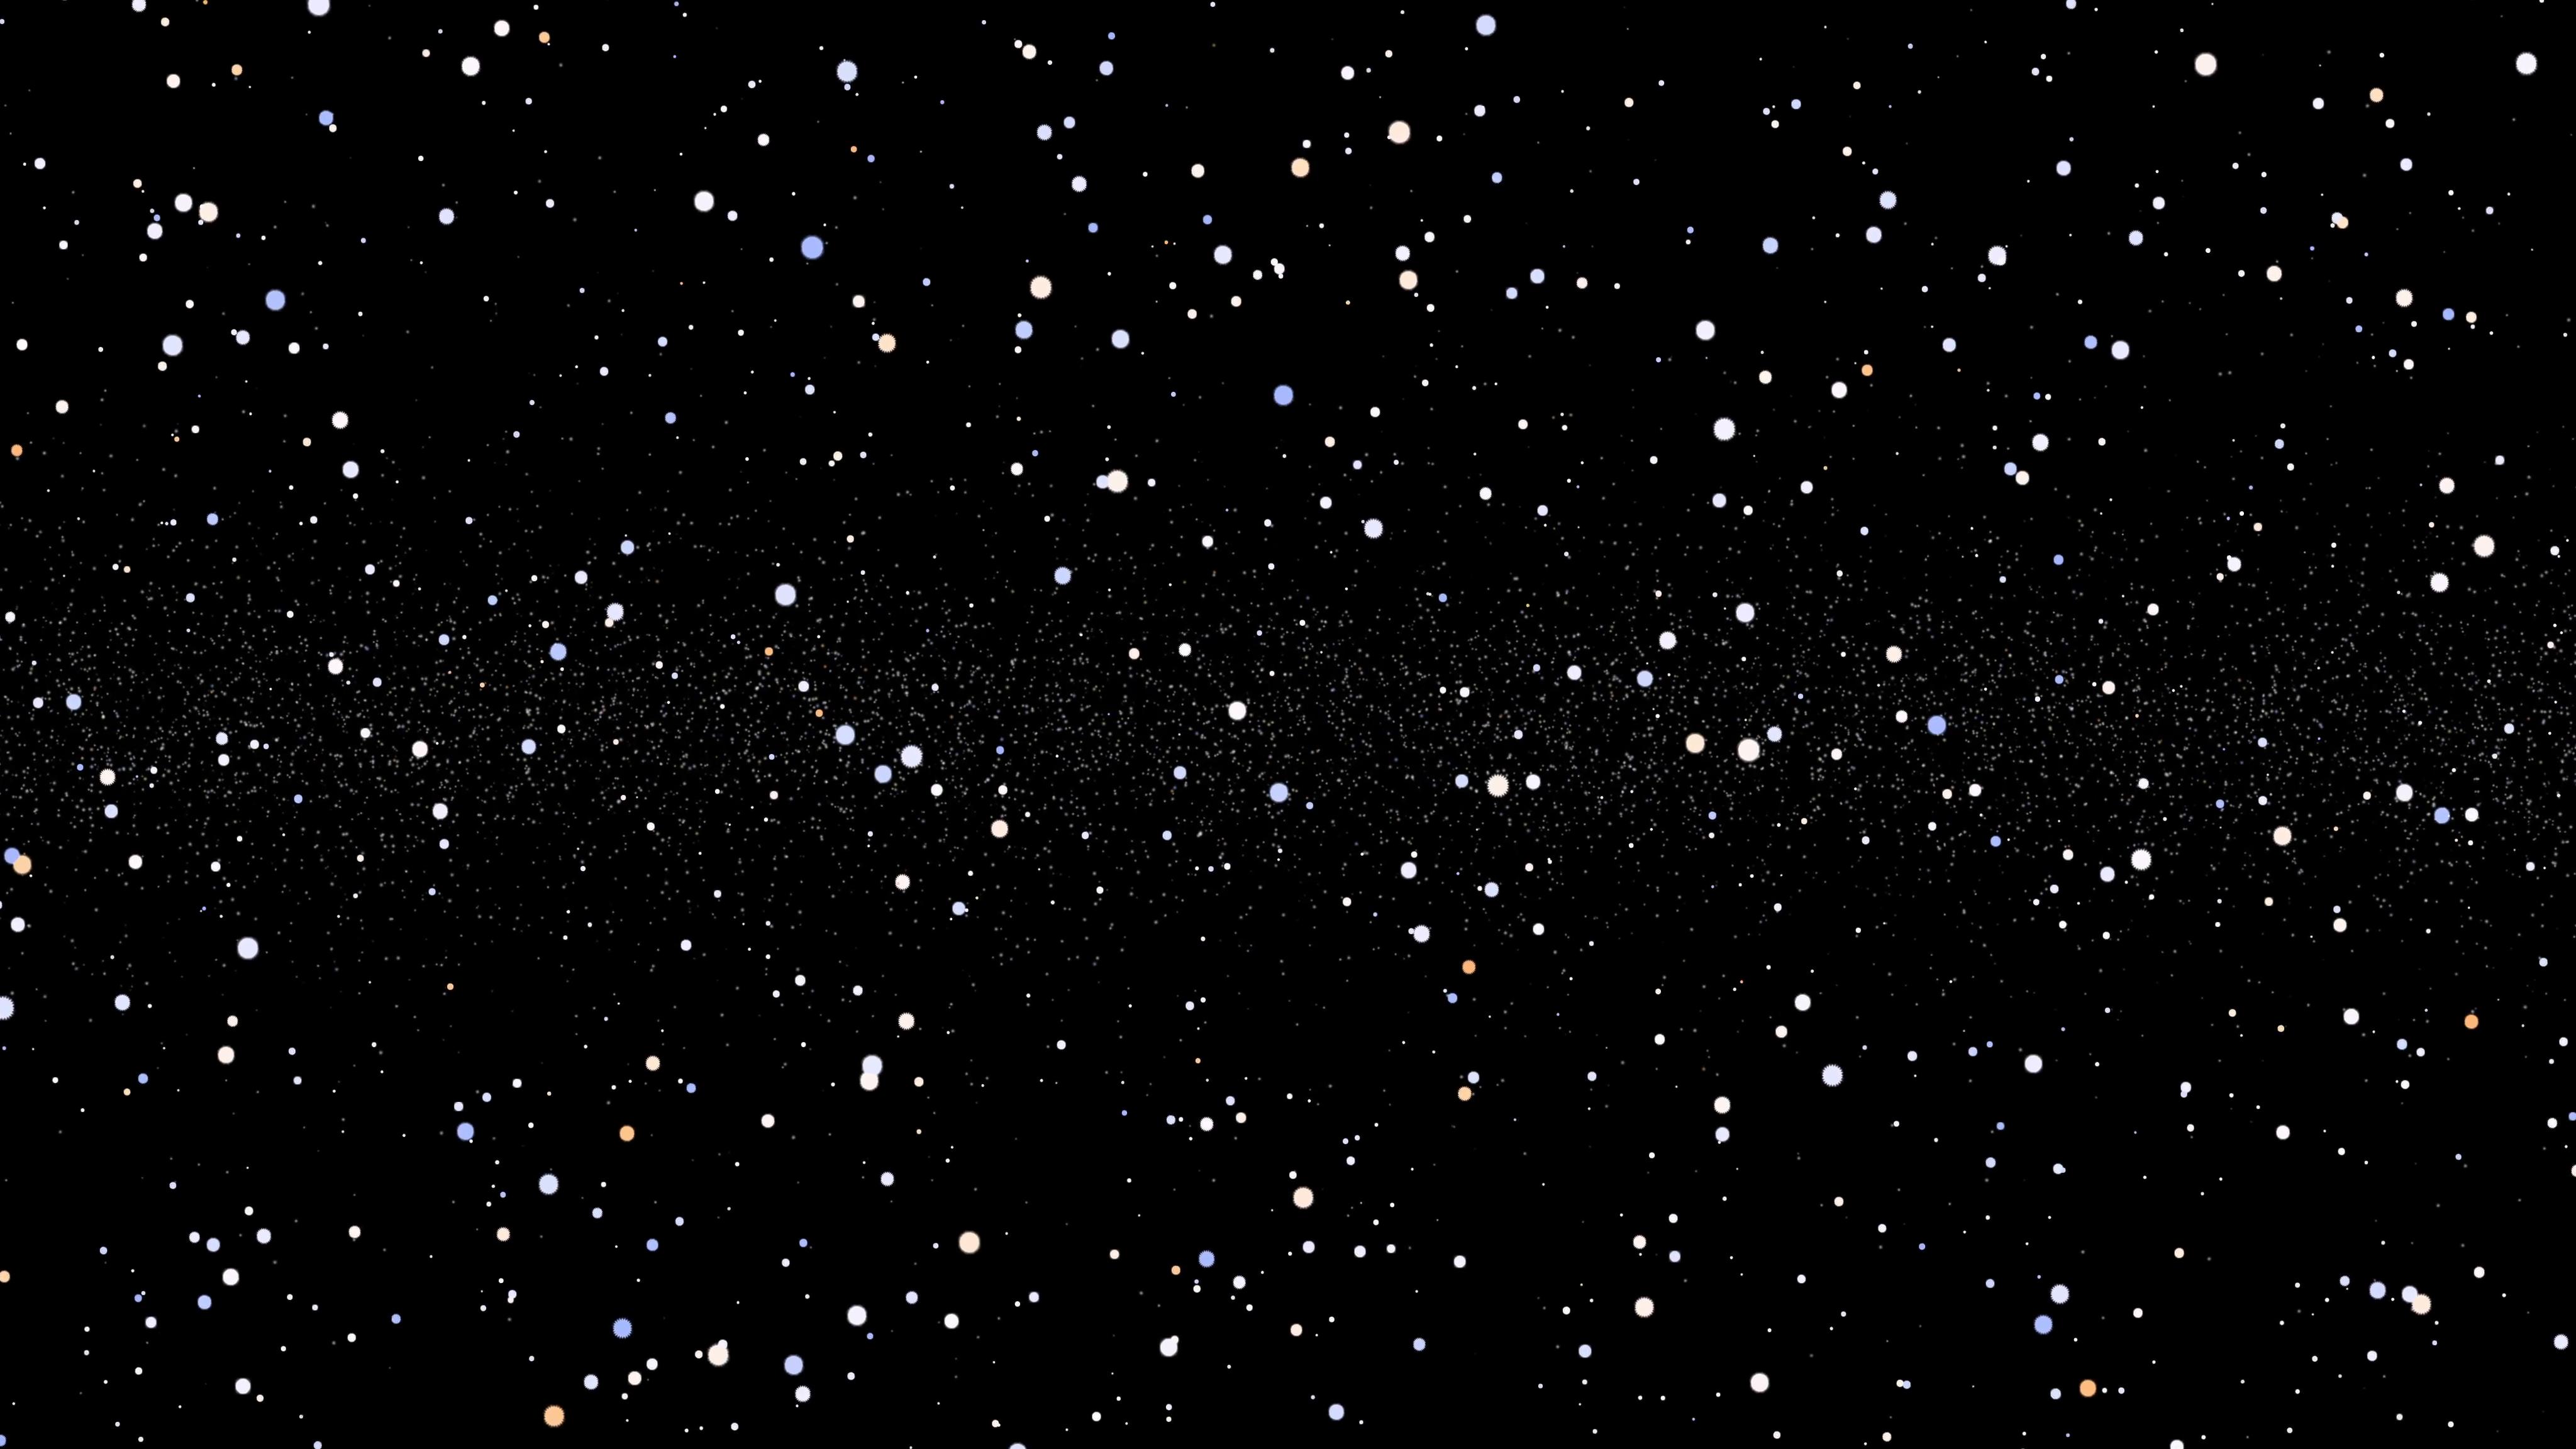 Starfield in Space Motion Background - Videoblocks